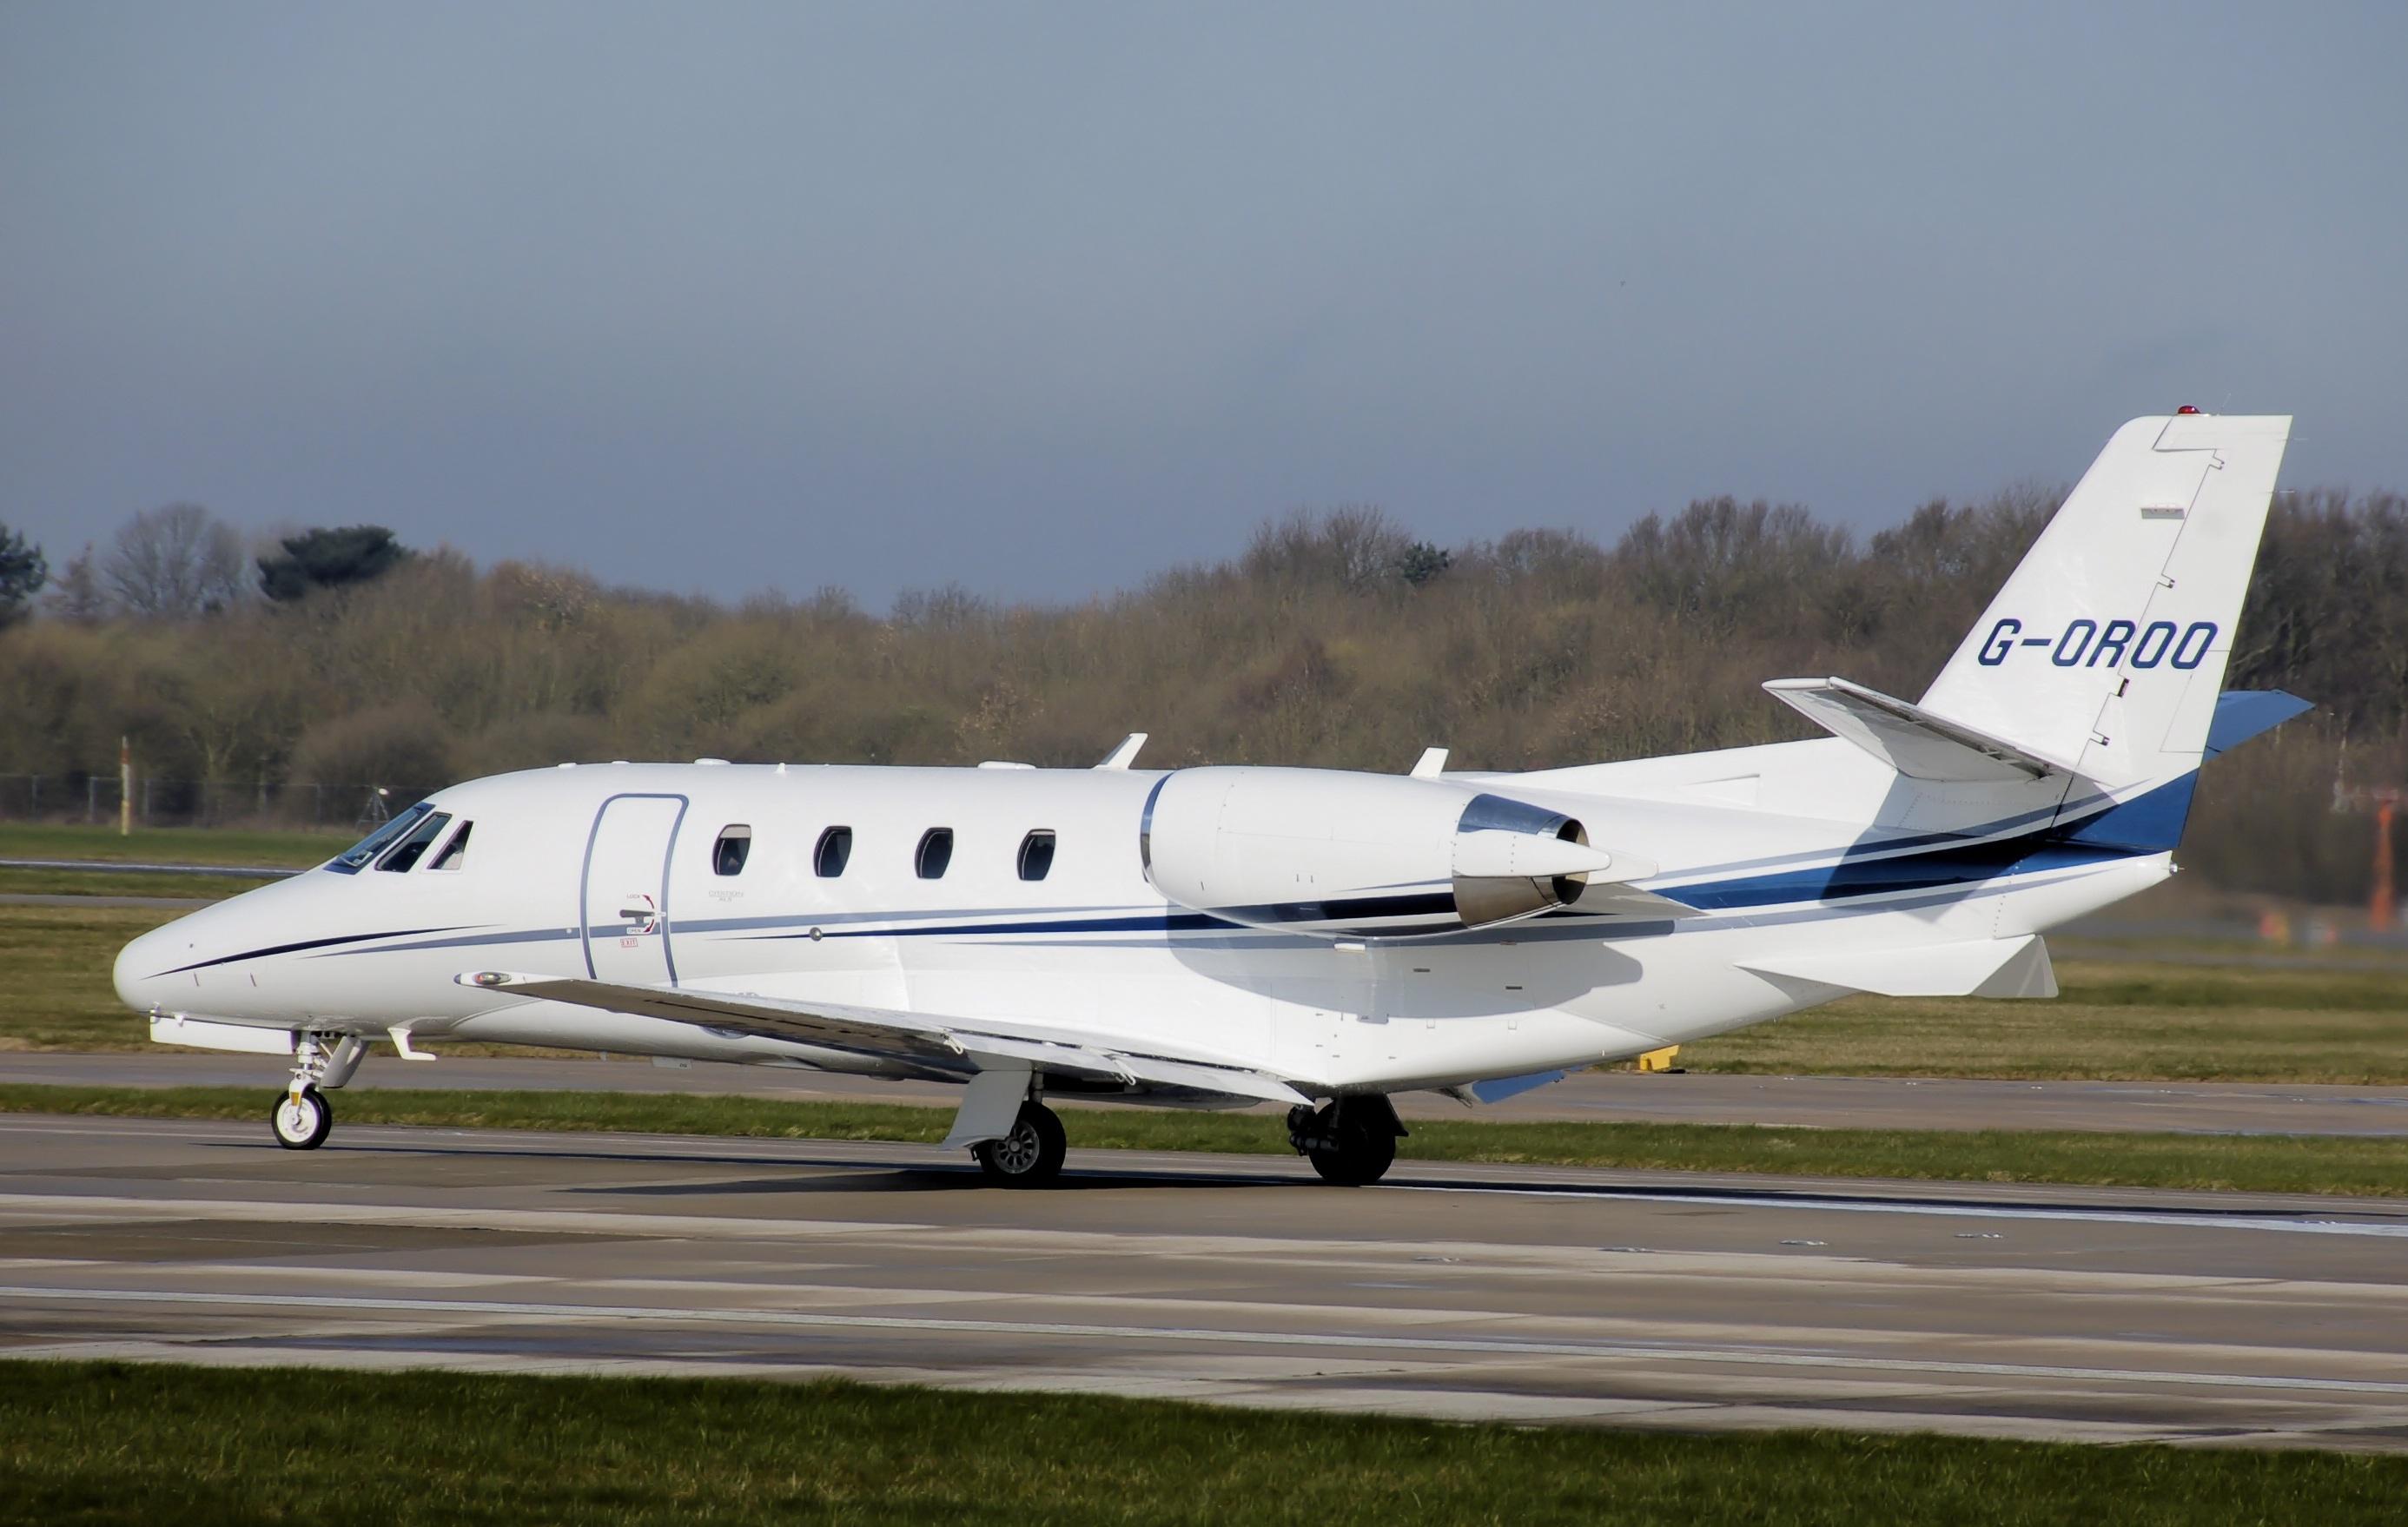 Photo Of White Cessna Citation Xls Aircraft Free Image